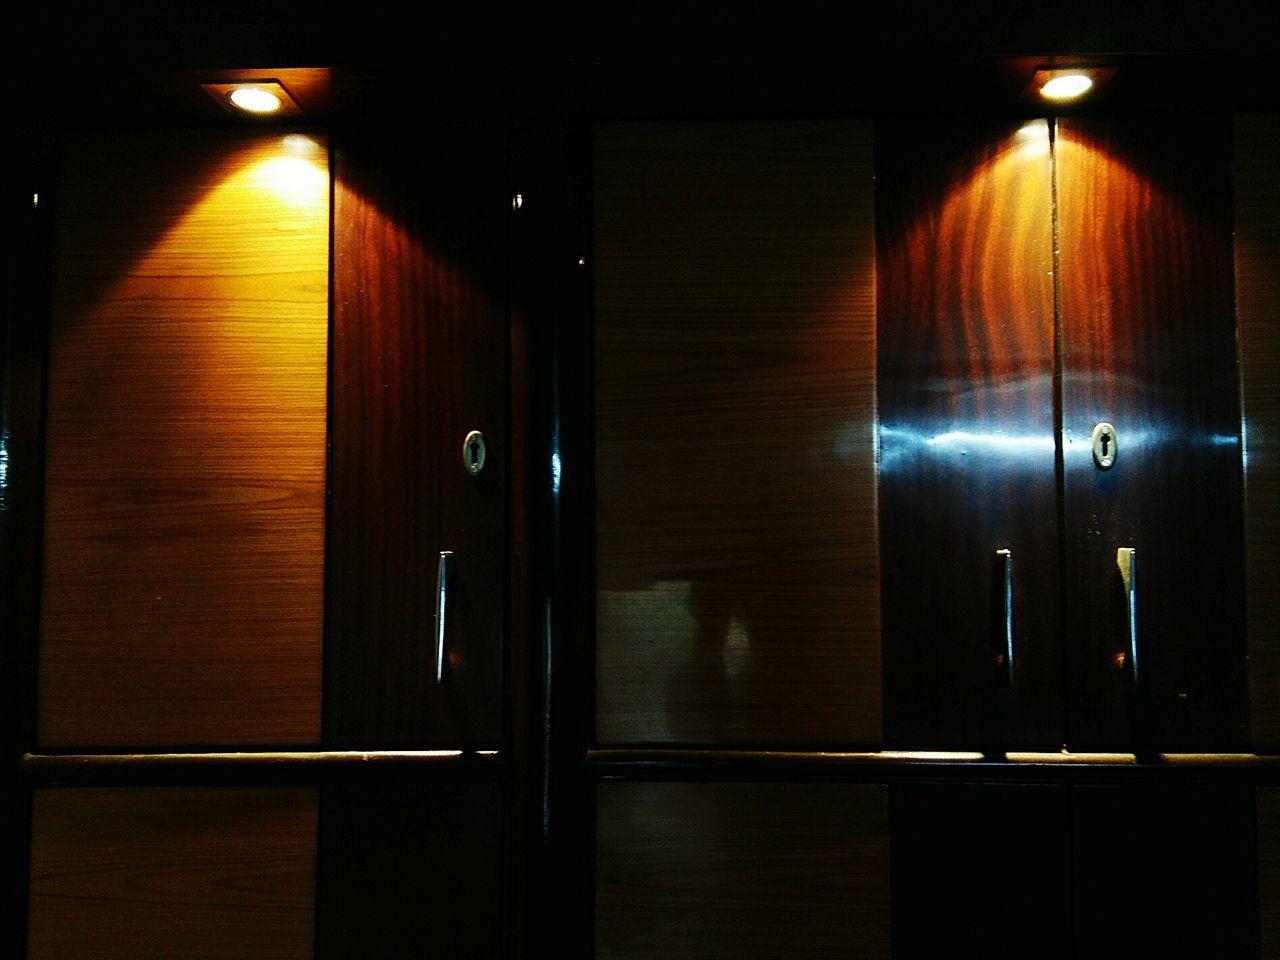 Door Elevator Illuminated Indoors  No People Ajar